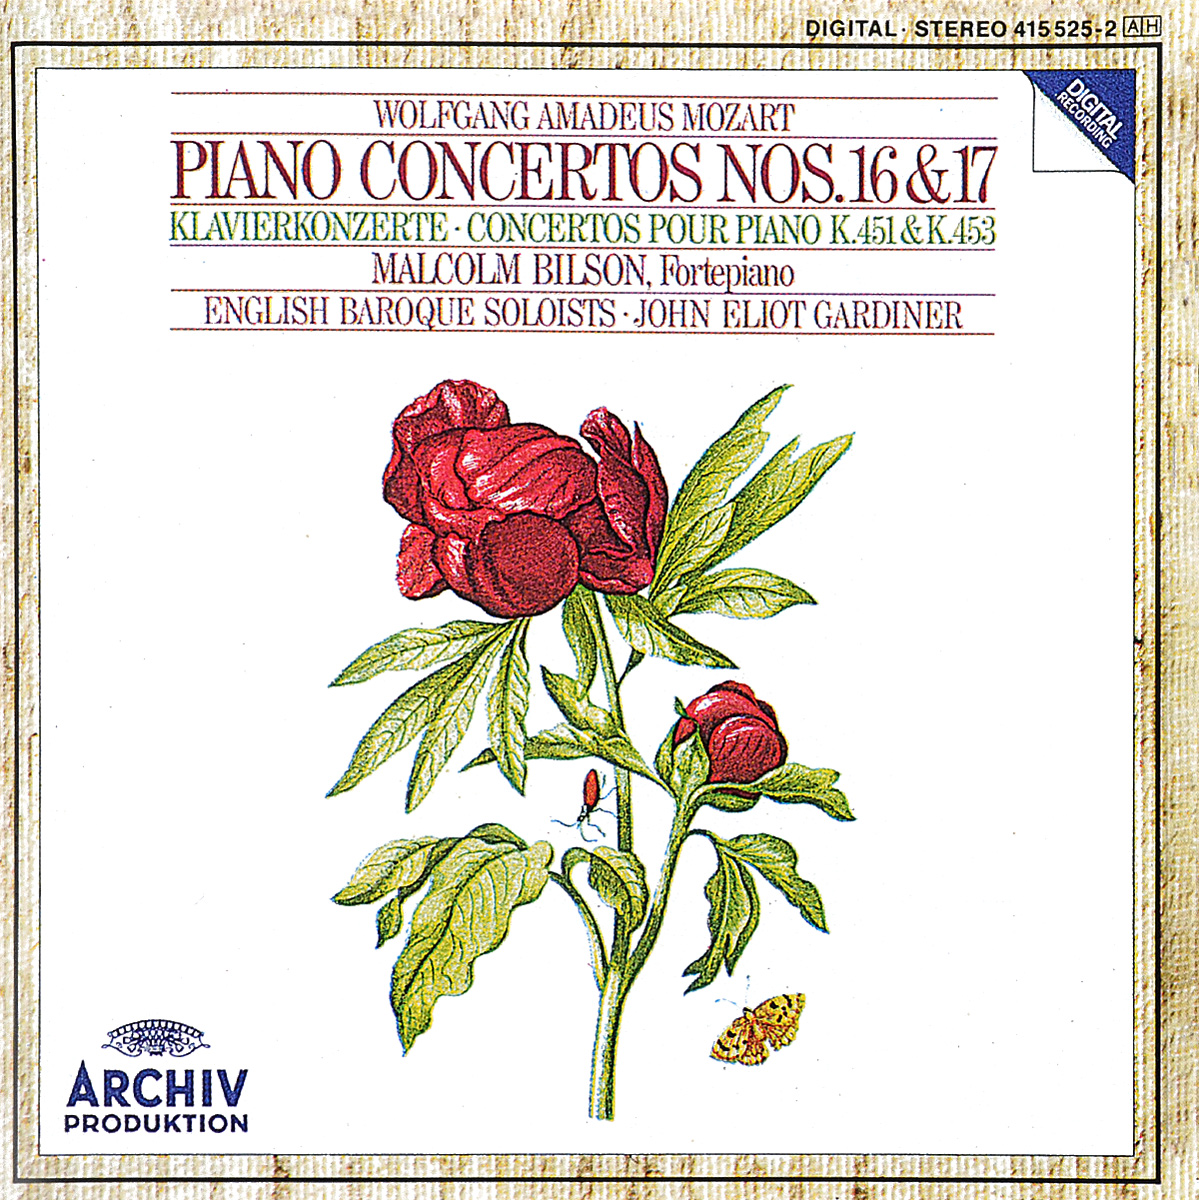 The English Baroque Soloists,Малкольм Билсон,Джон Элиот Гардинер John Eliot Gardiner. Mozart. Piano Concertos Nos. 16 & 17